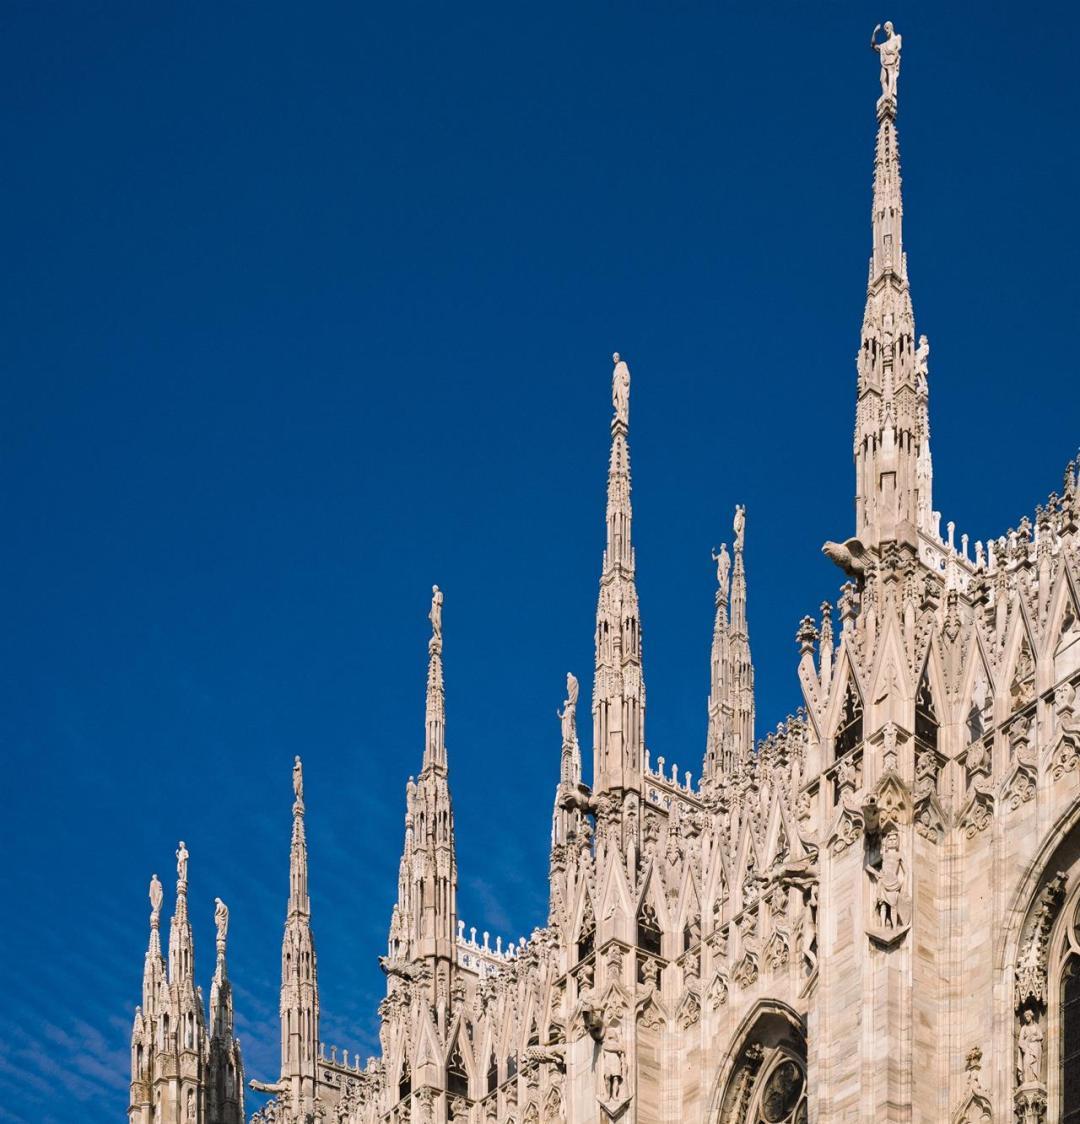 Duomo Milano Samuel Zeller Unsplash